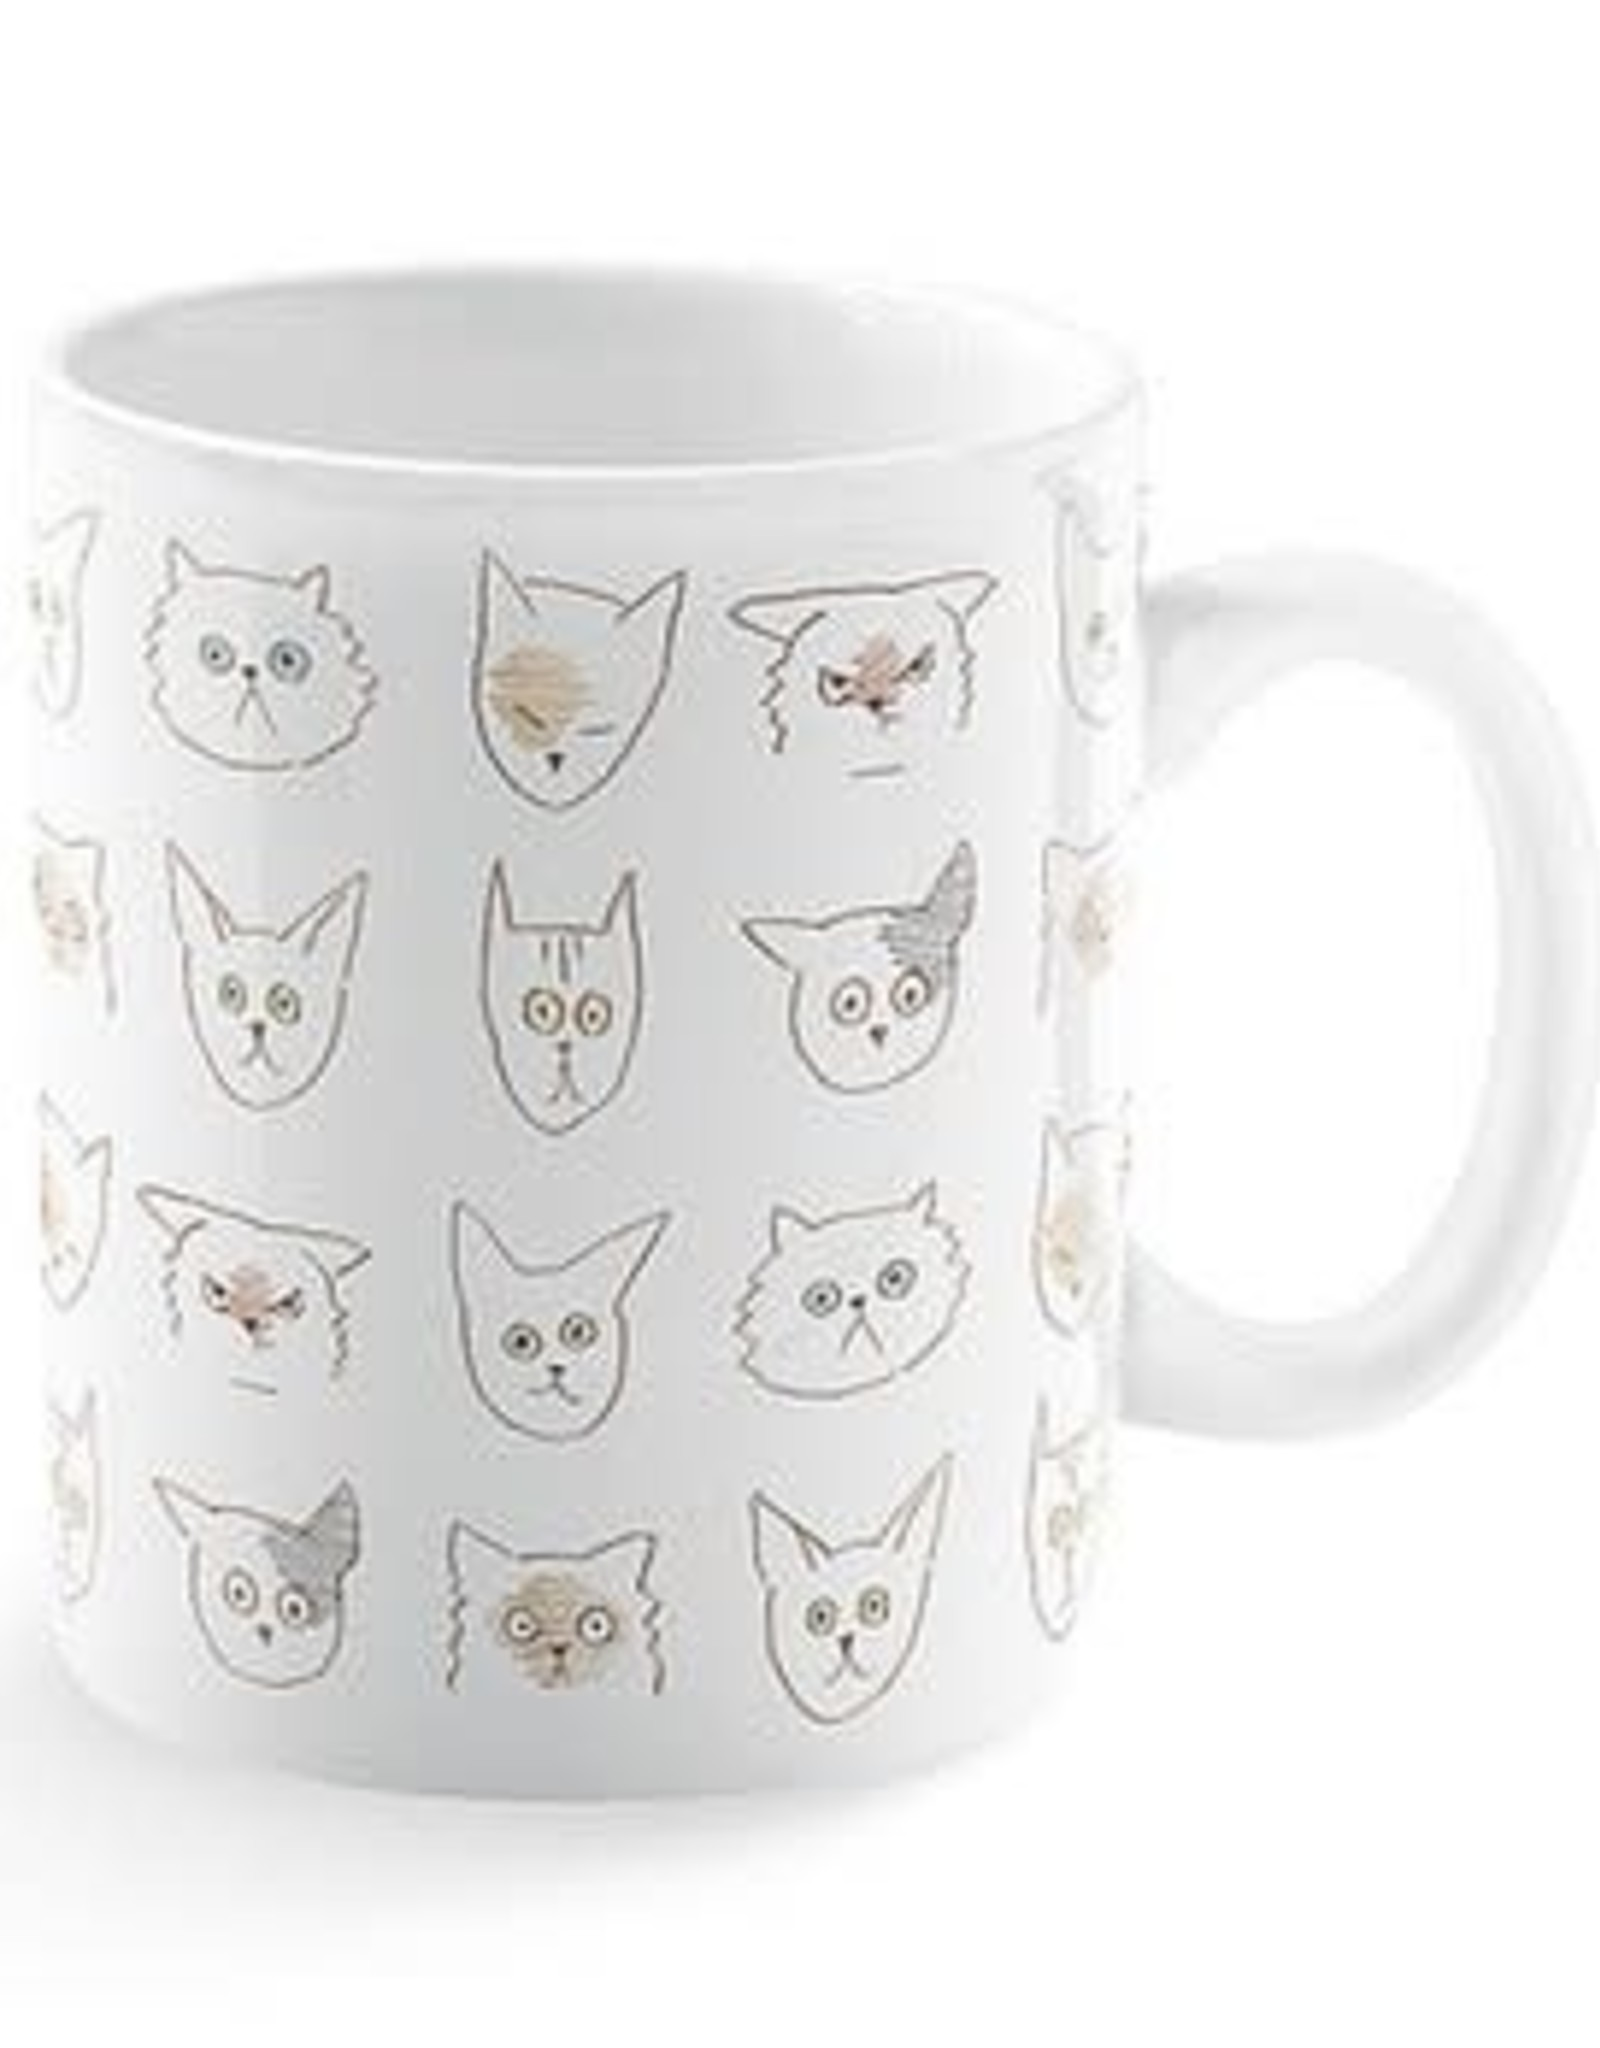 Pet Shop by Fringe Studio Doodle Cat Montana Mug